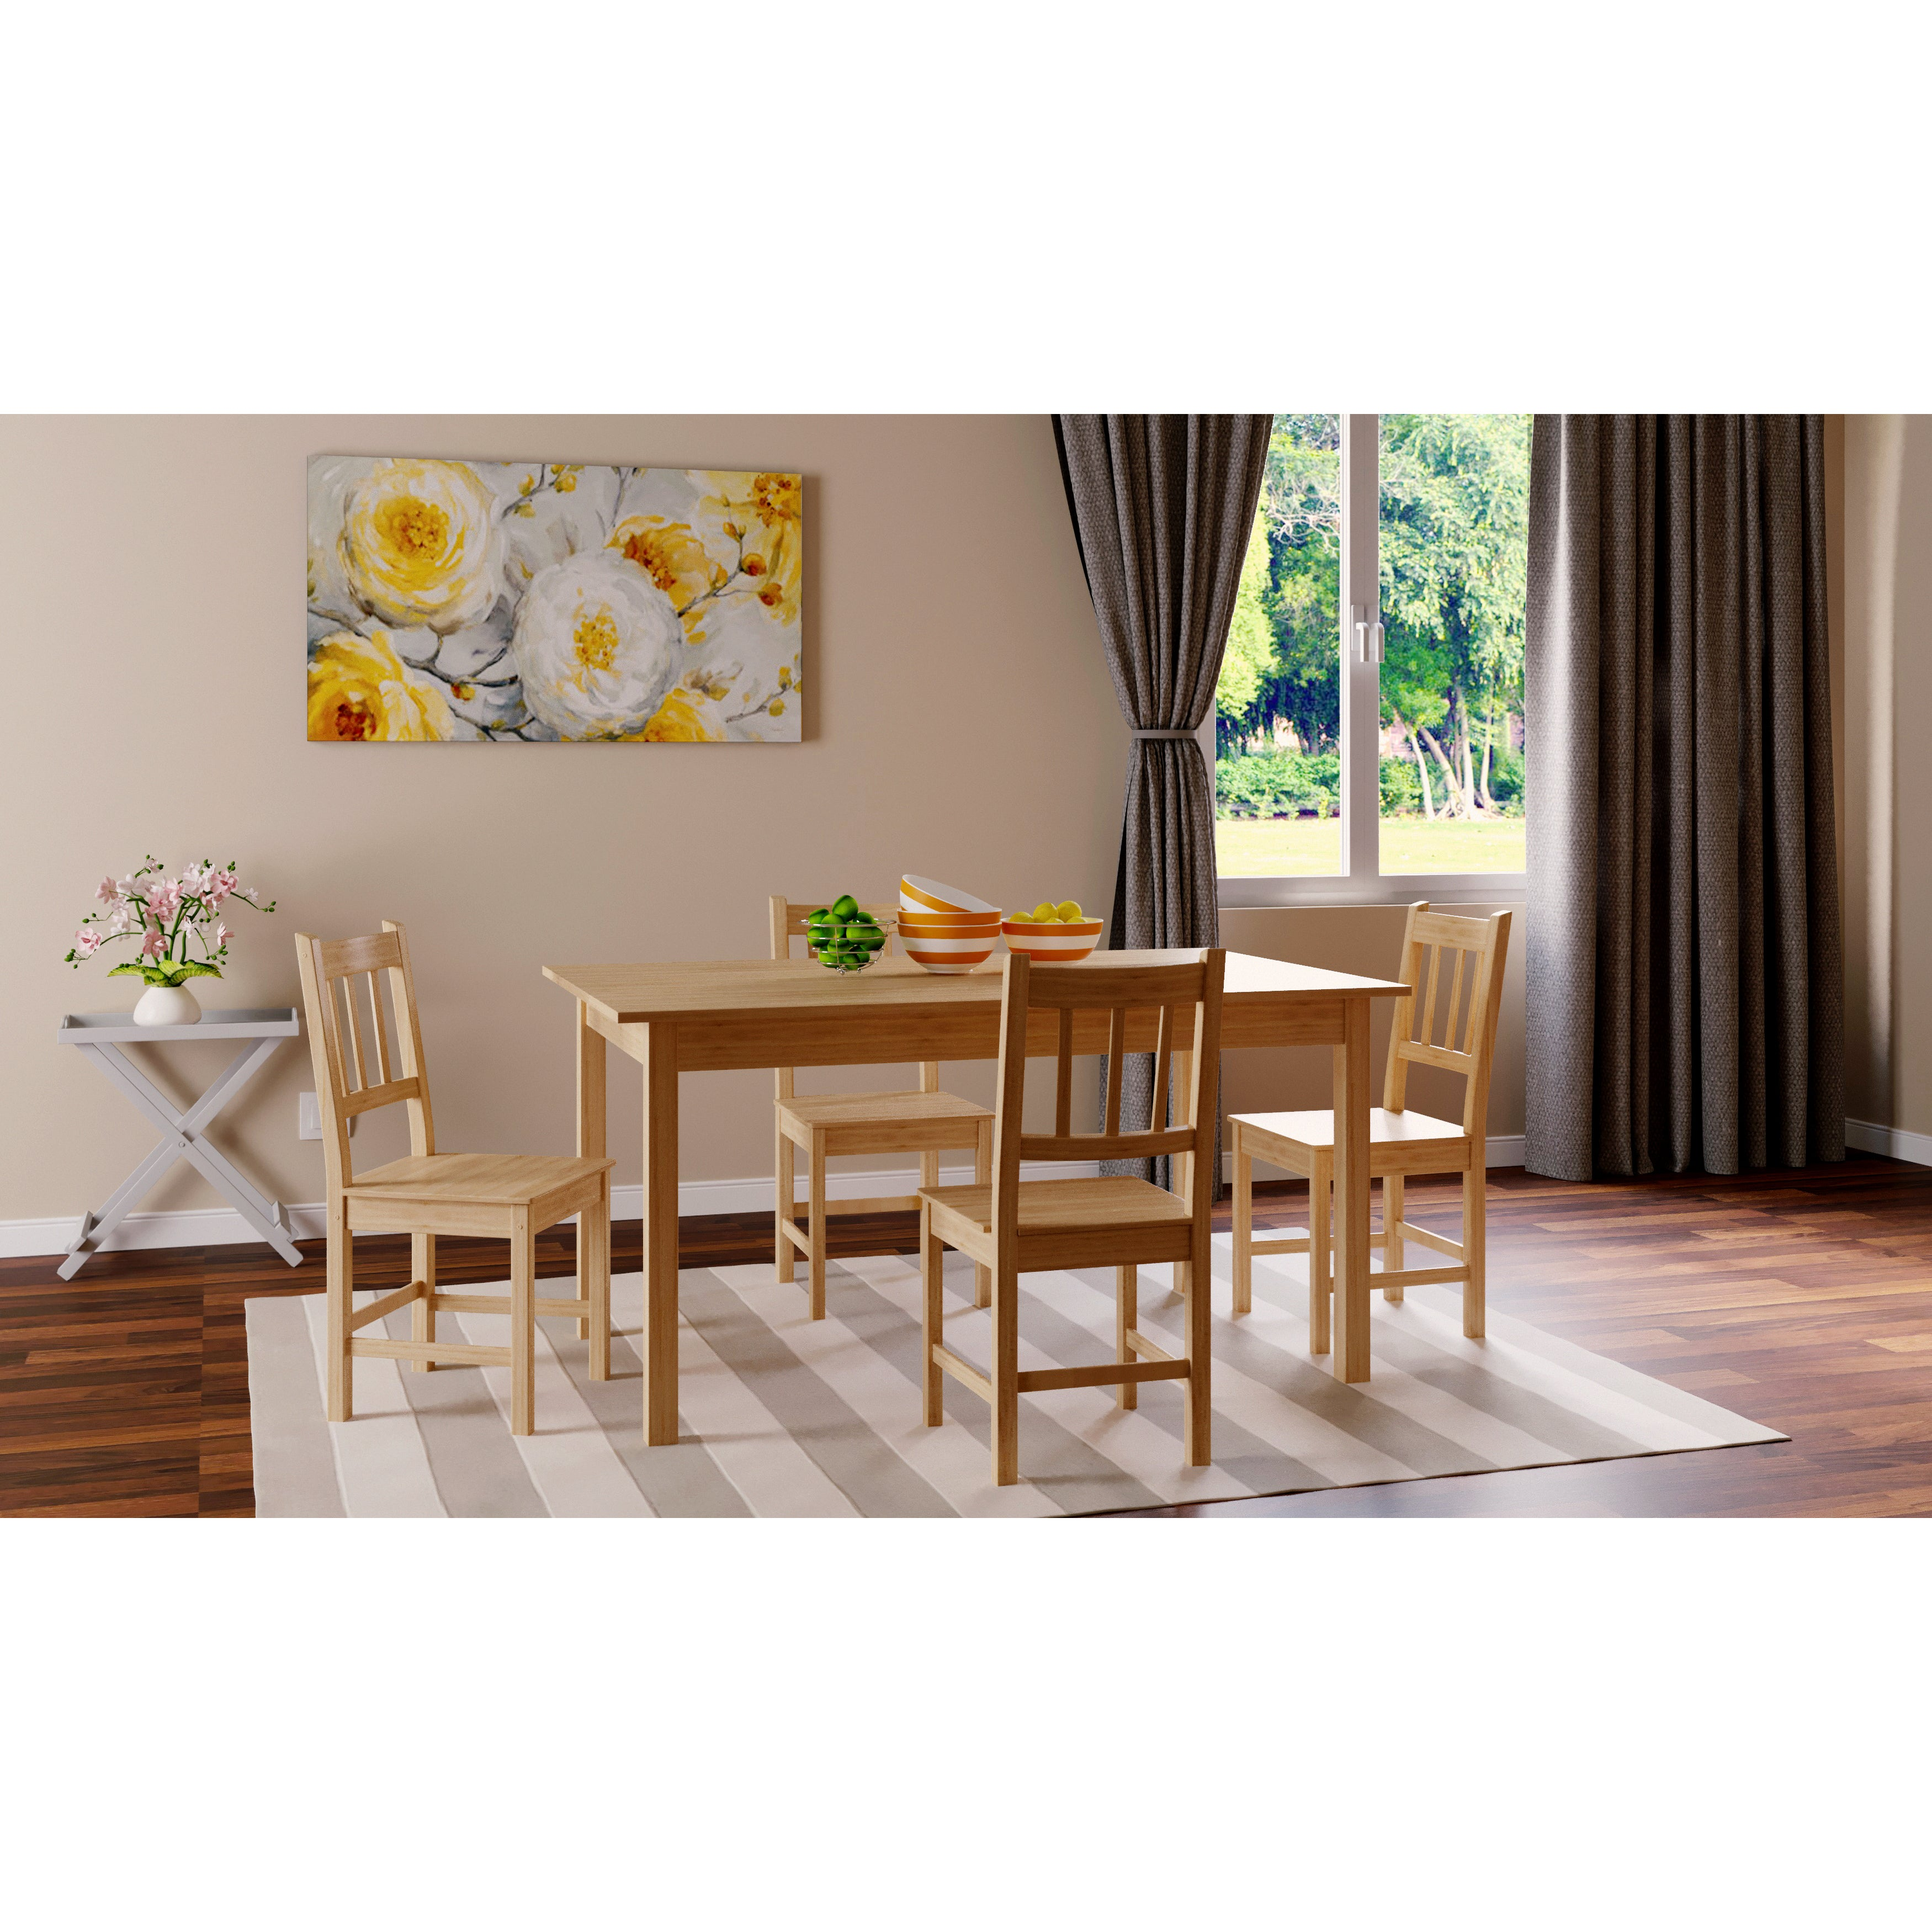 Simple Living Bamboo 5-piece Dining Set (5pc Bamboo Dinin...